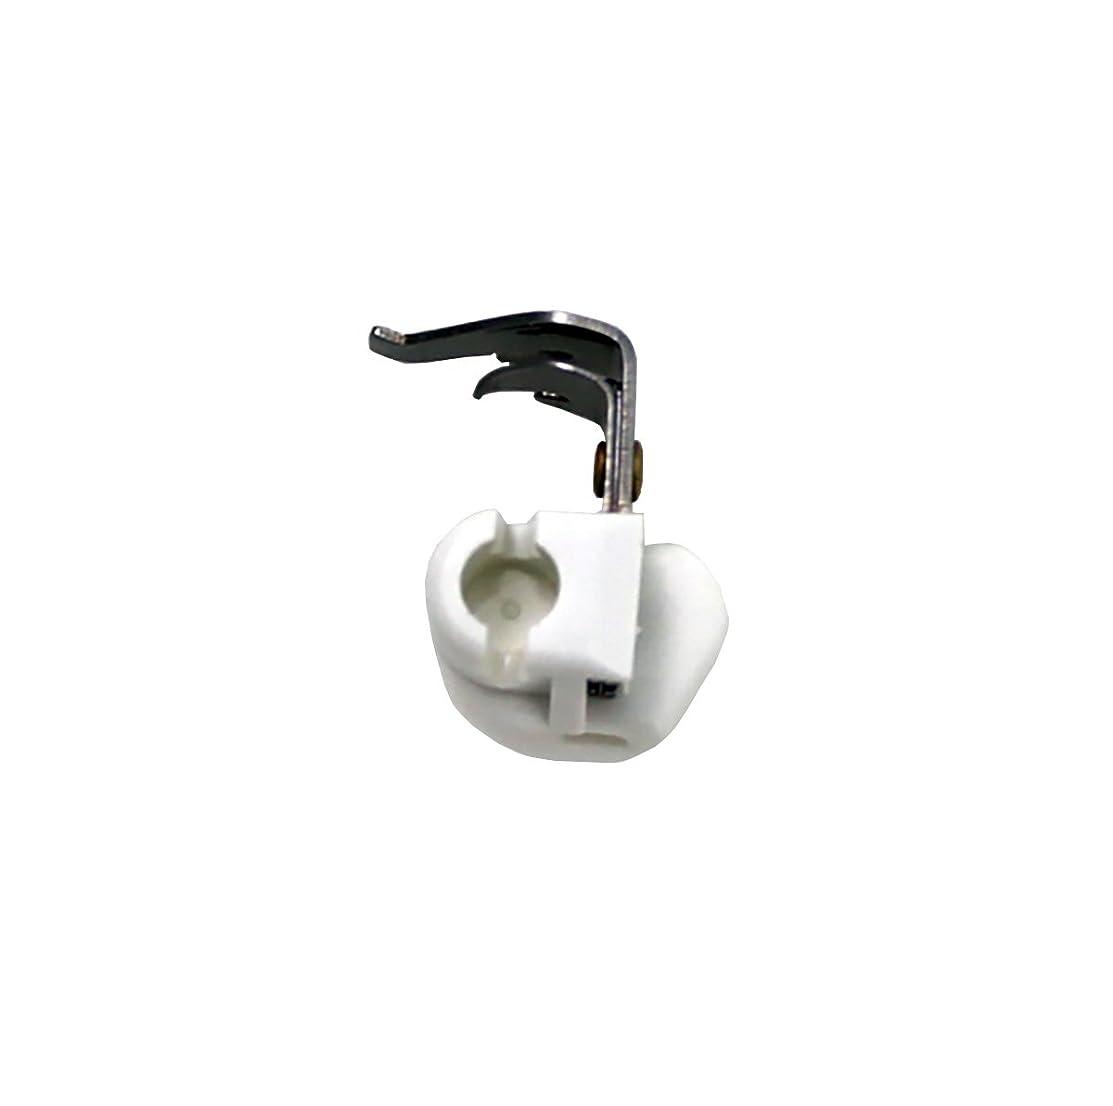 Juki TL98Q/QE, 2000I & 2010Q Replacement Needle Threader